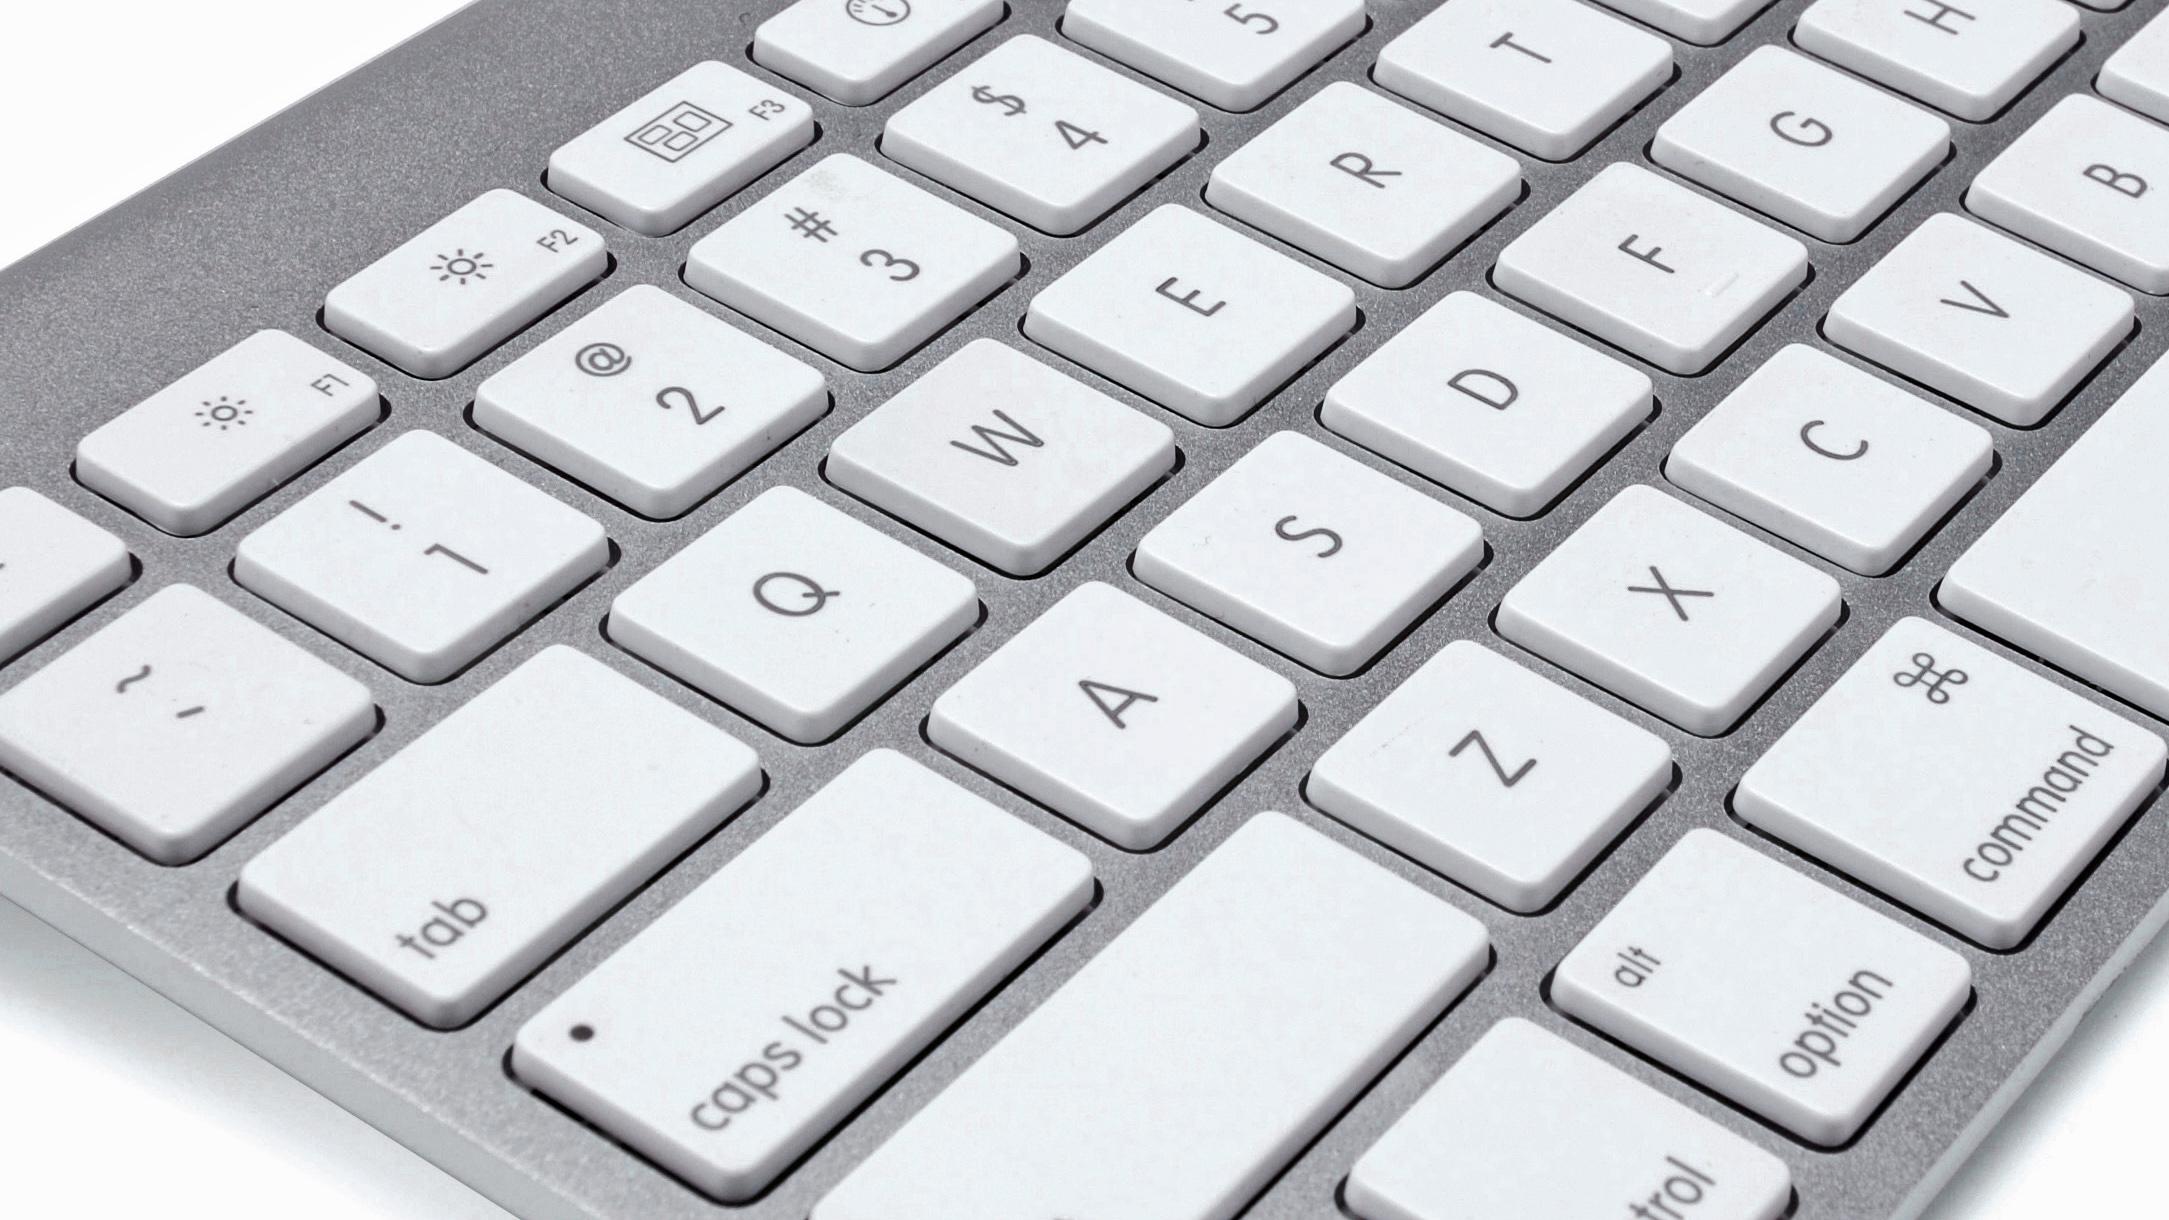 MacBook Pro - Apple Community